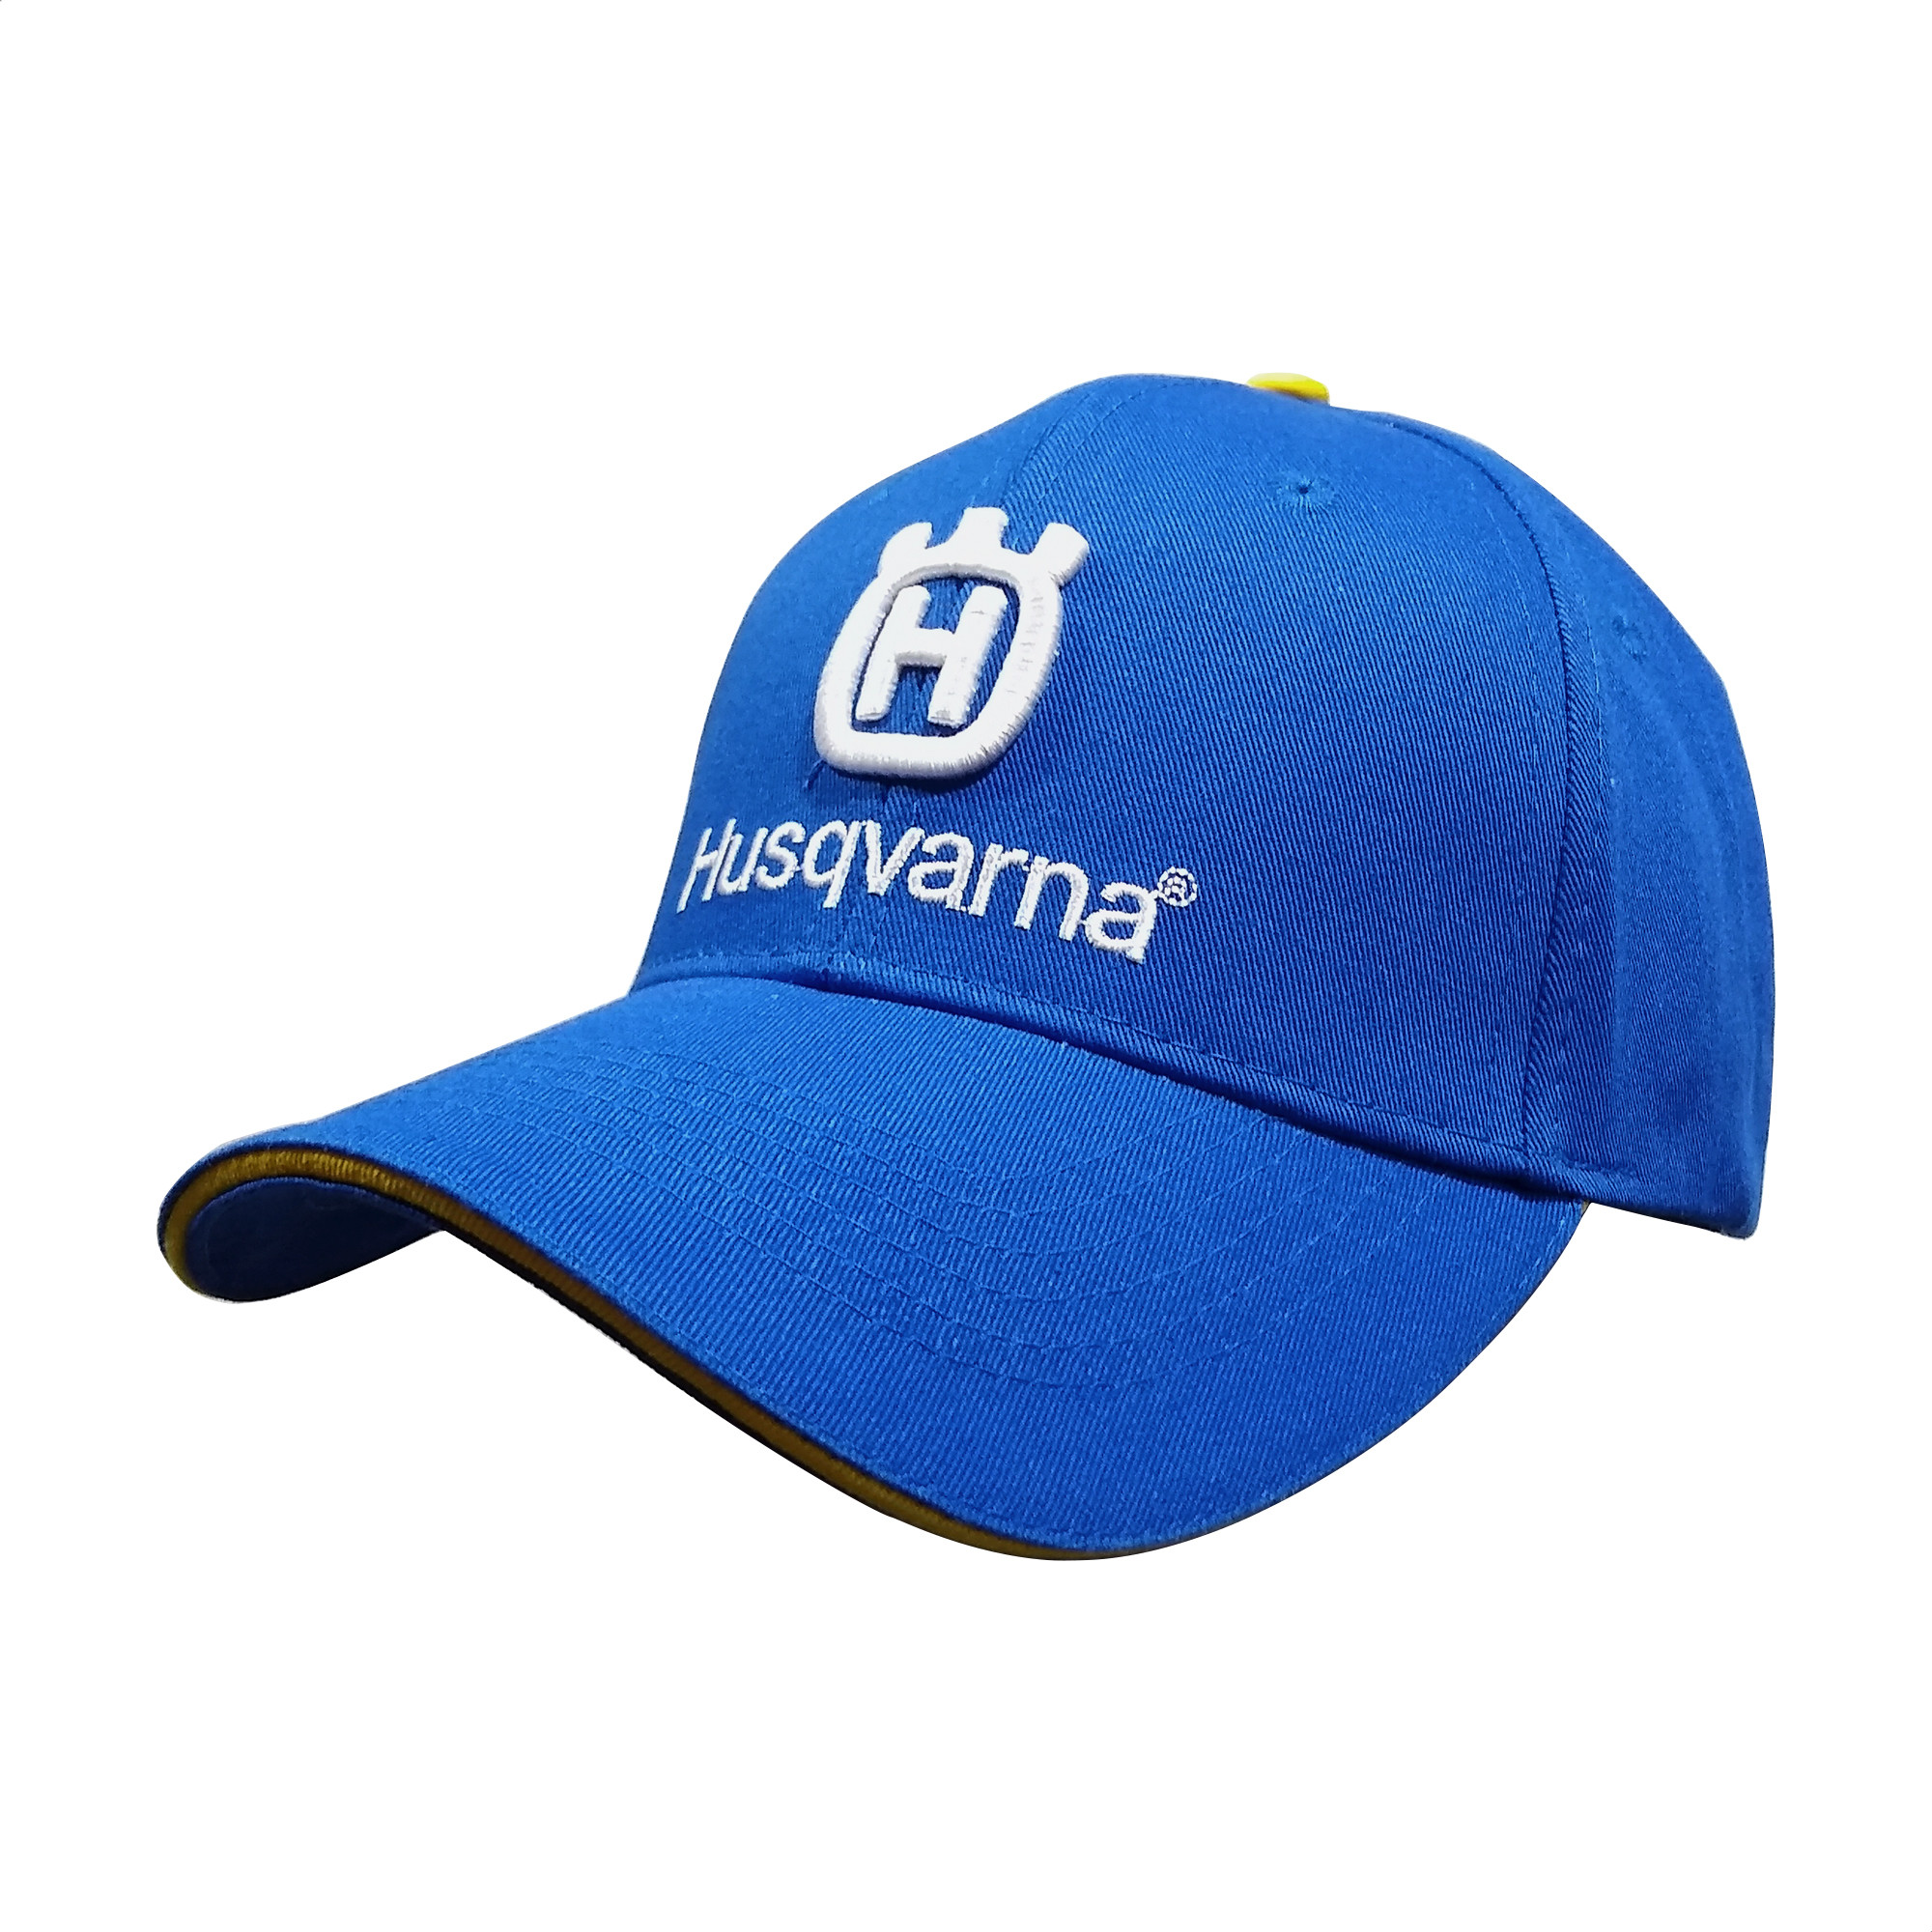 Gorra Husqvarna Azul Logo Blanco